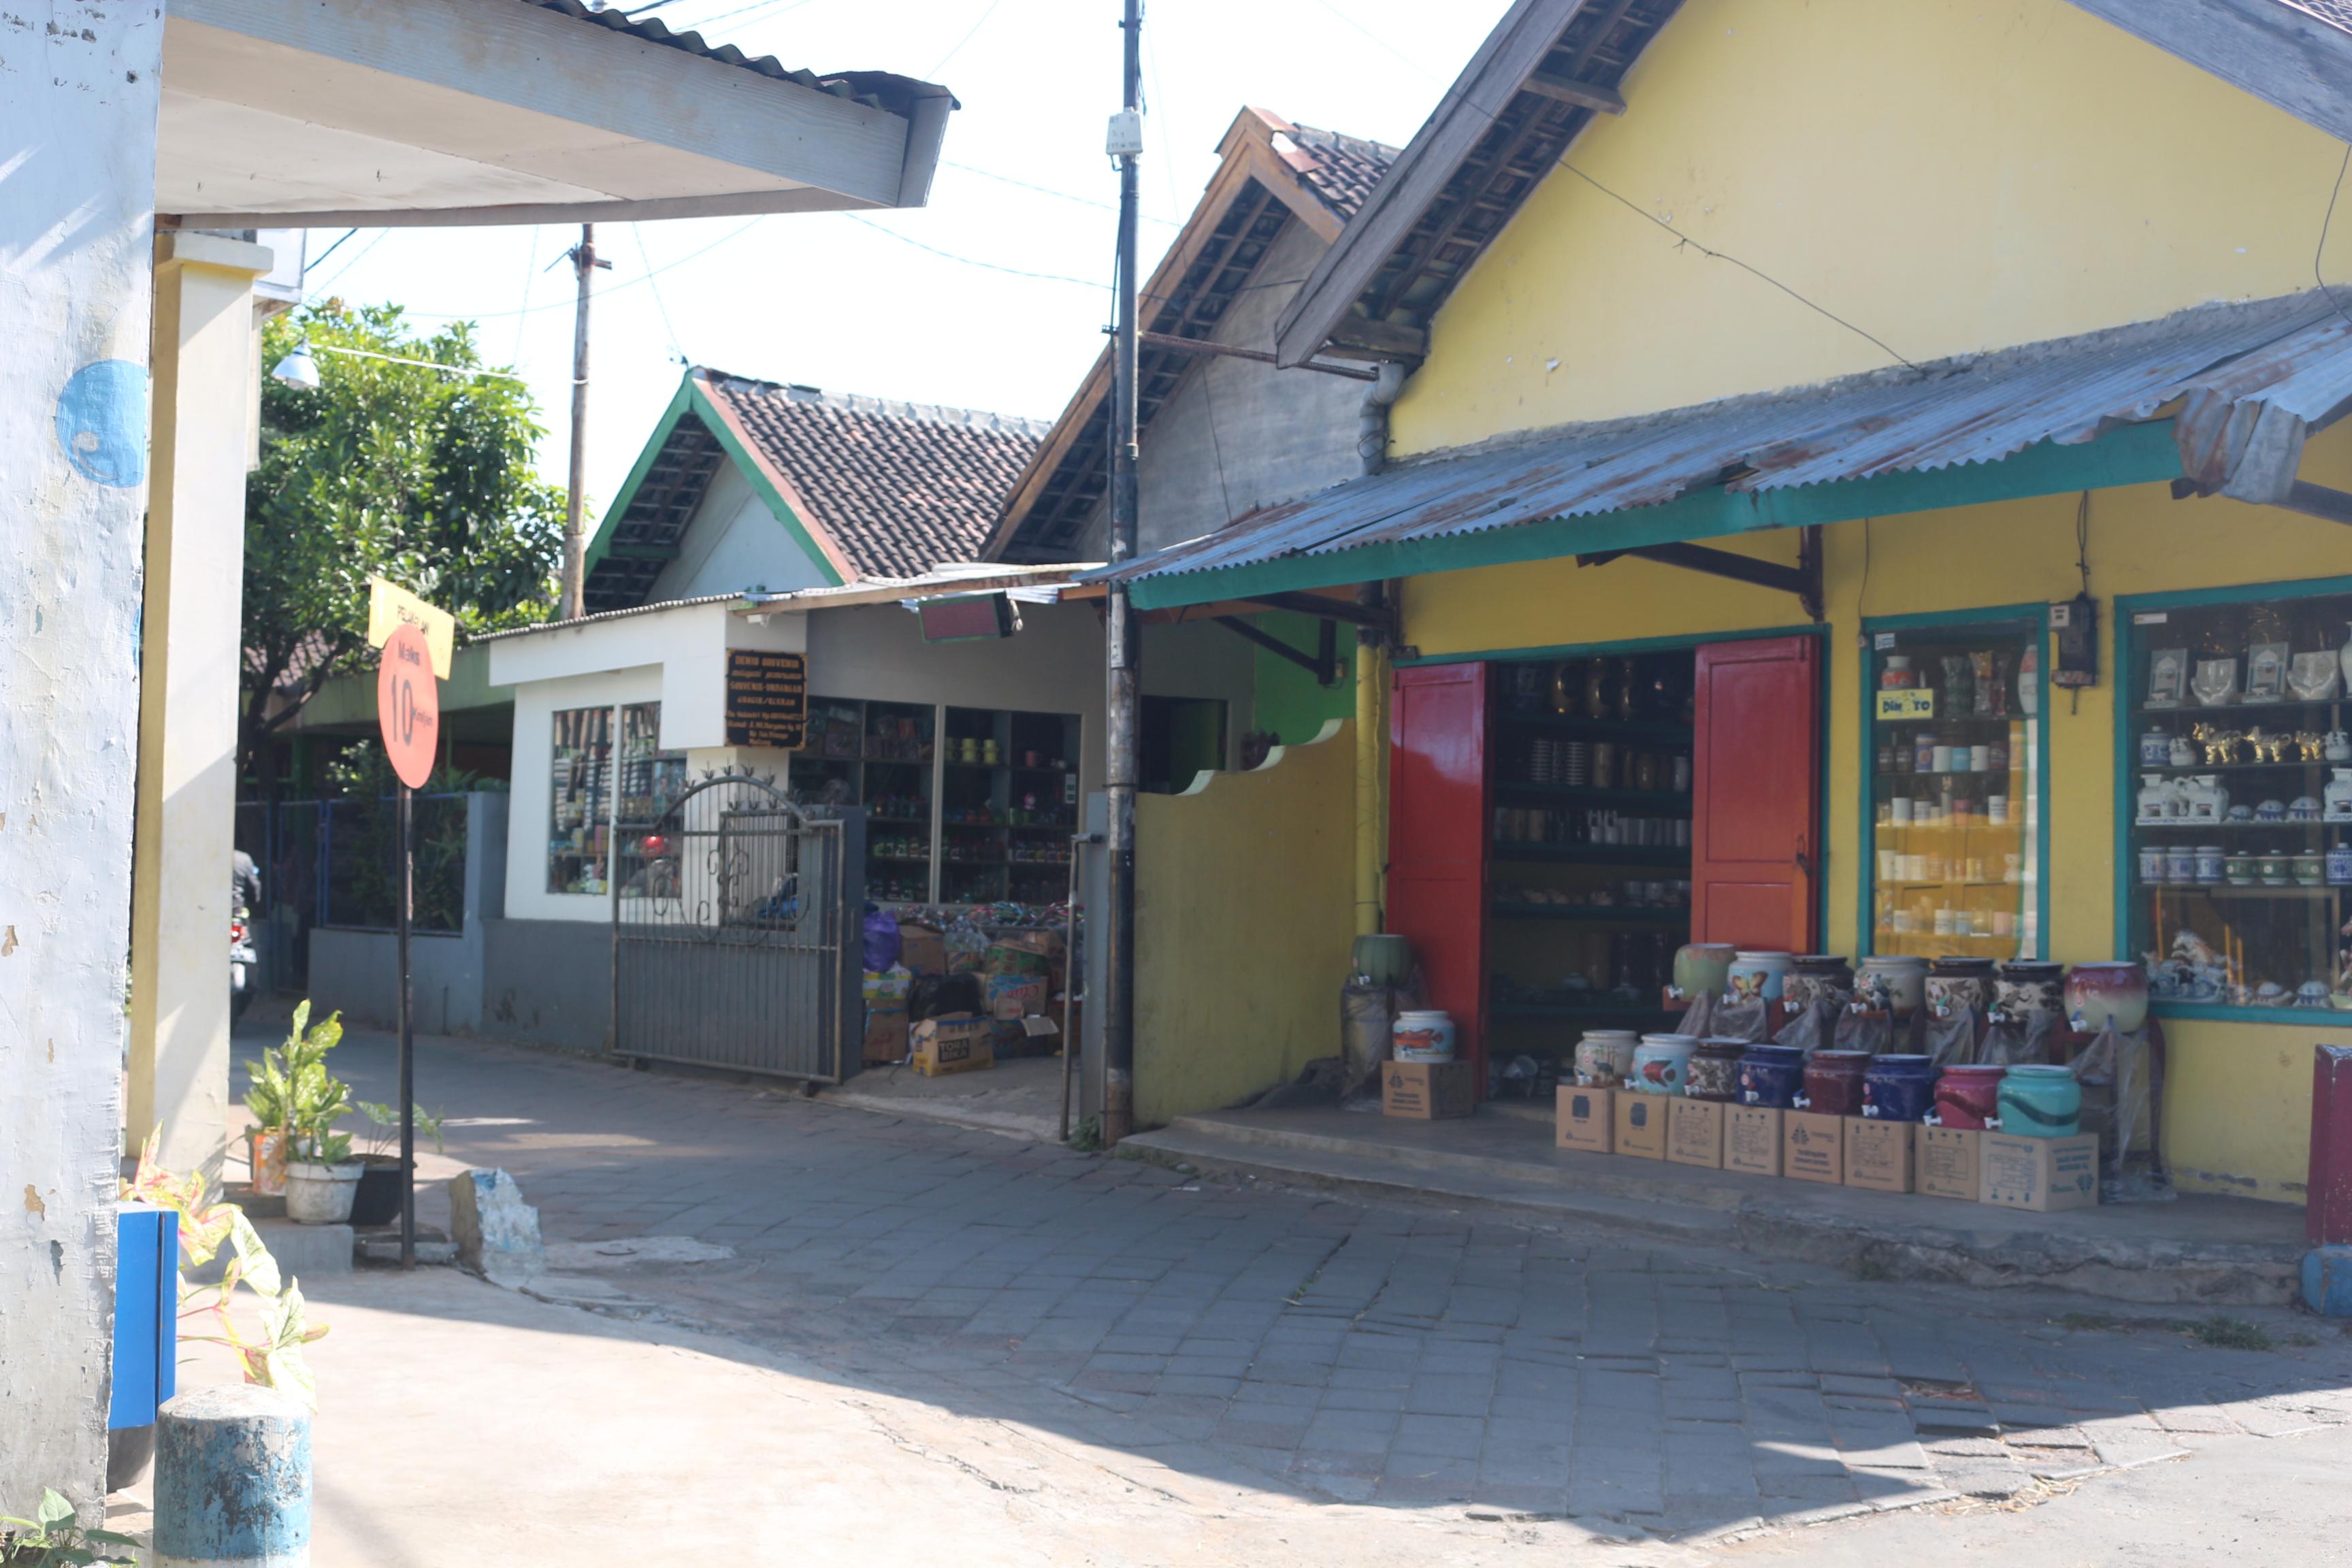 Kampung Wisata Keramik Dinoyo Aroundngalam Kota Malang Identik Sebagai Penghasil